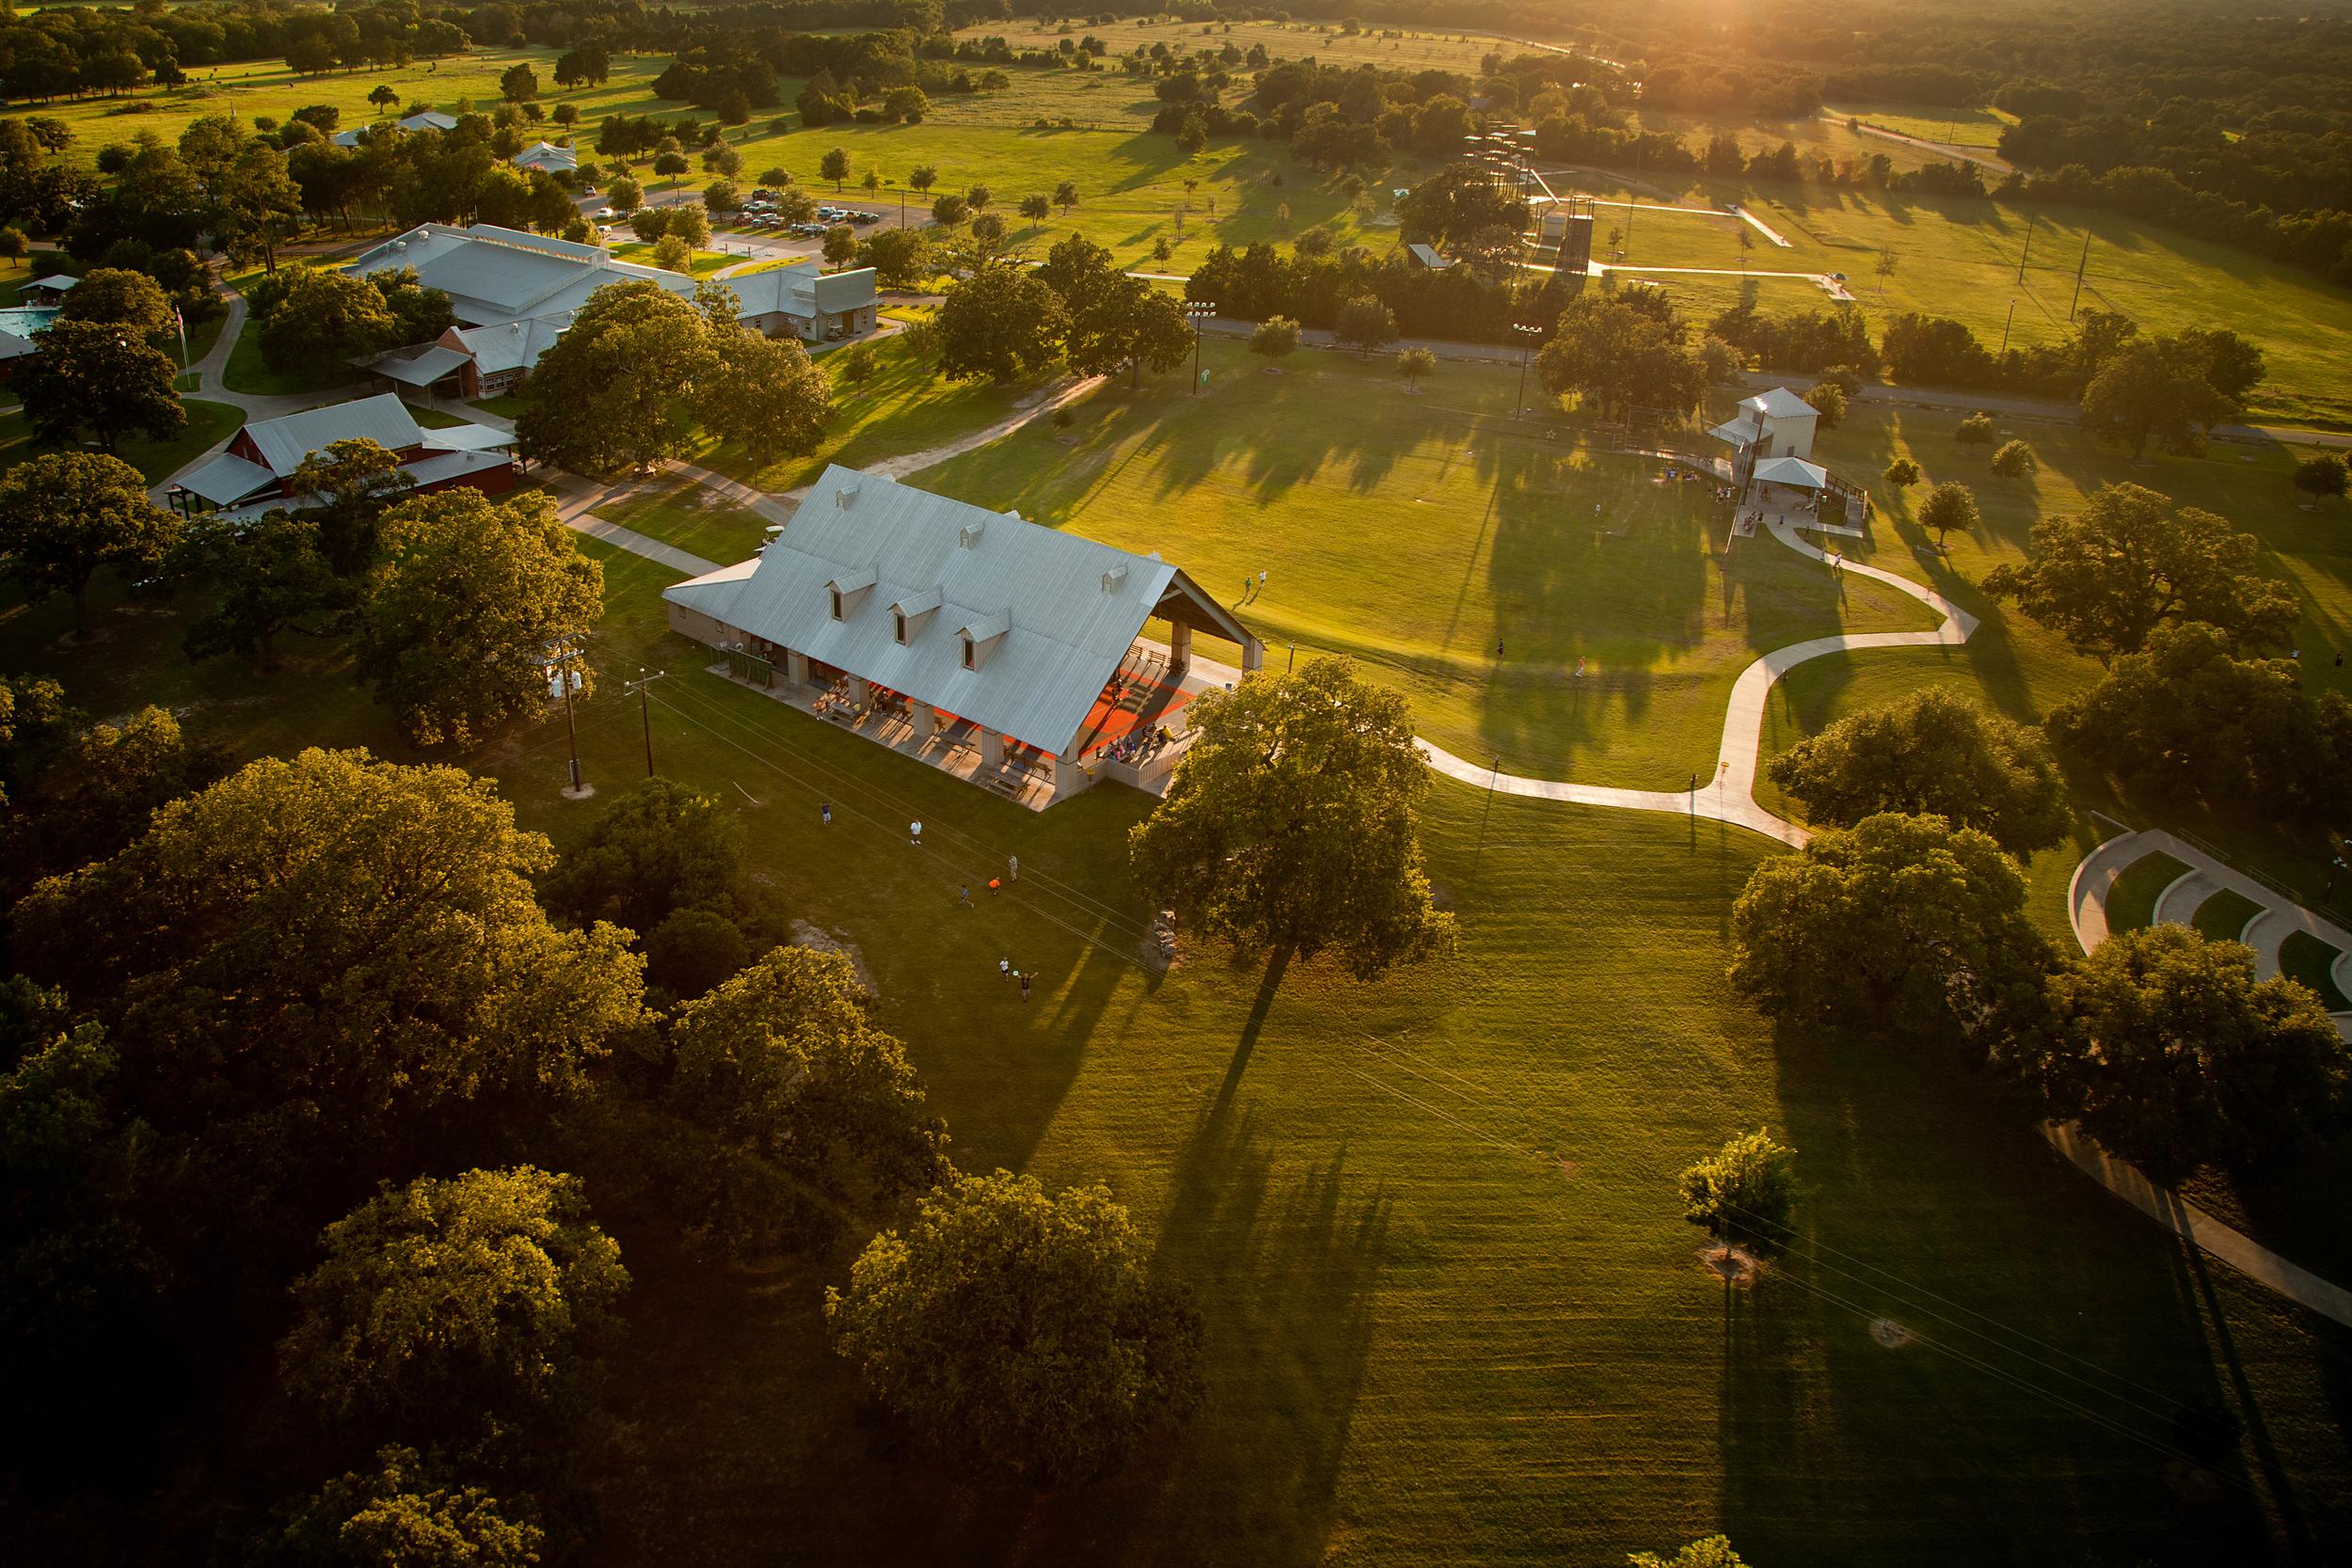 Aerial - Camp For All Pavilion, Main Lodge, Art Barn